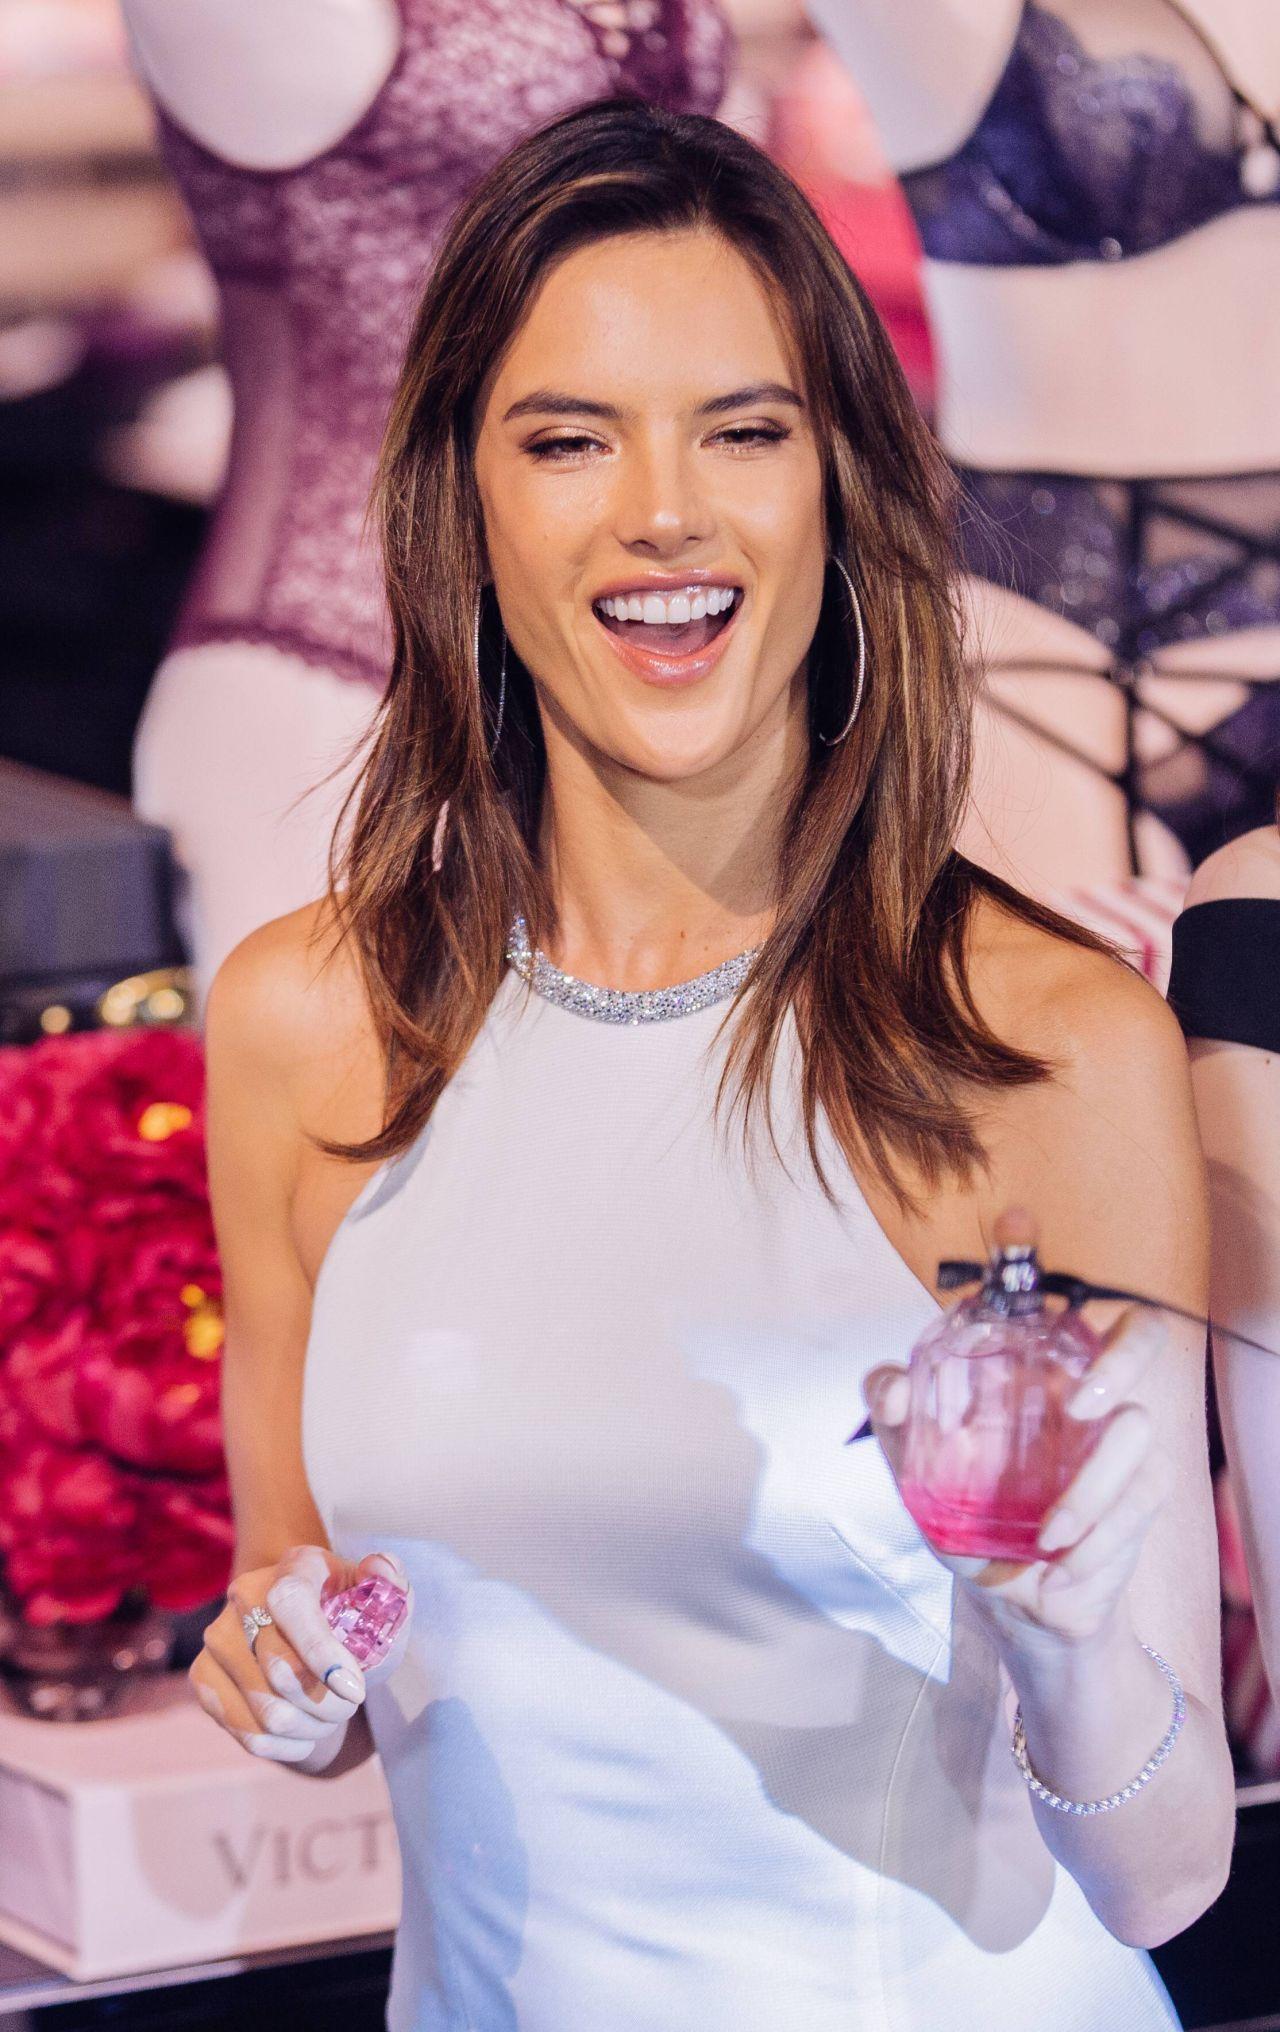 Alessandra Ambrosio - Victoria's Secret Store Grand ... алессандра амбросио